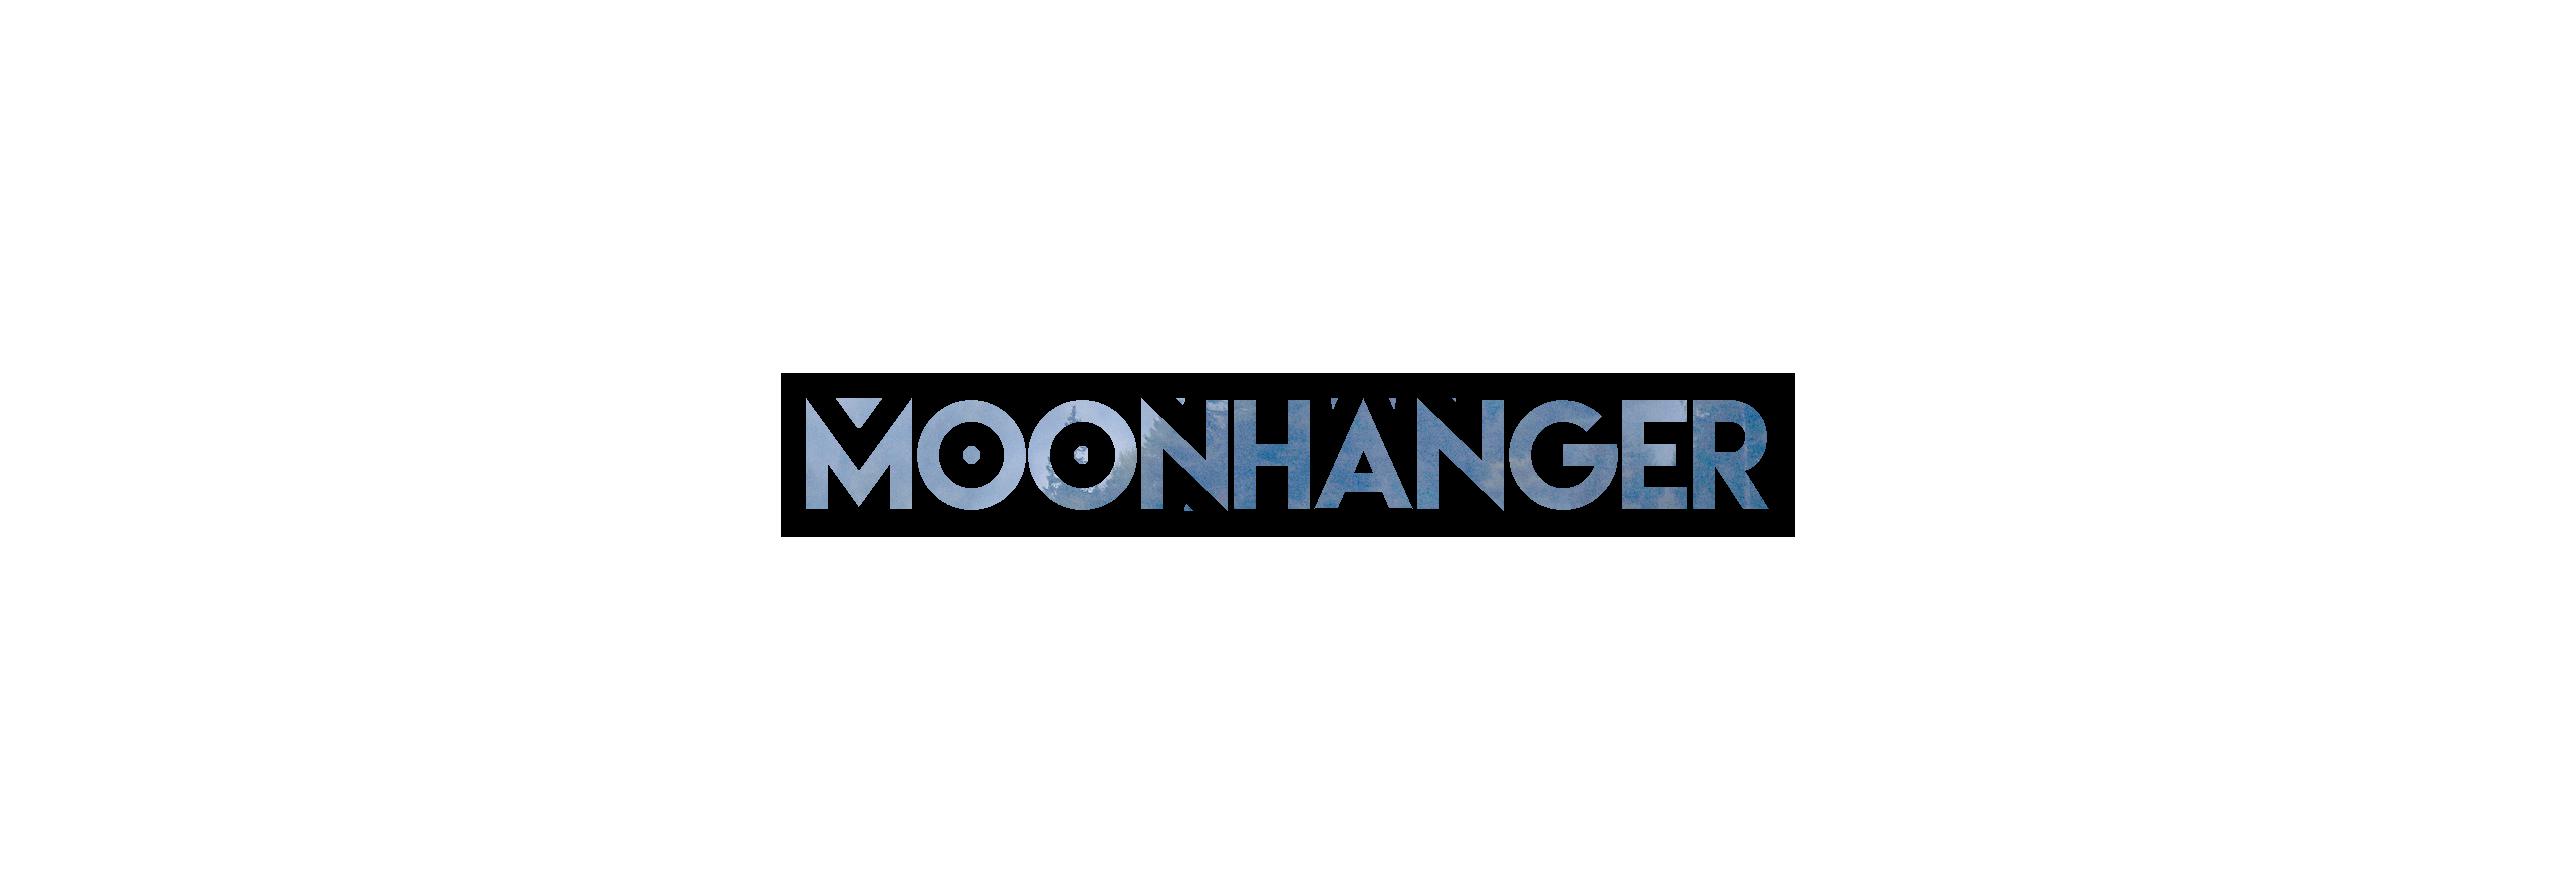 br-site-banner-moonhanger